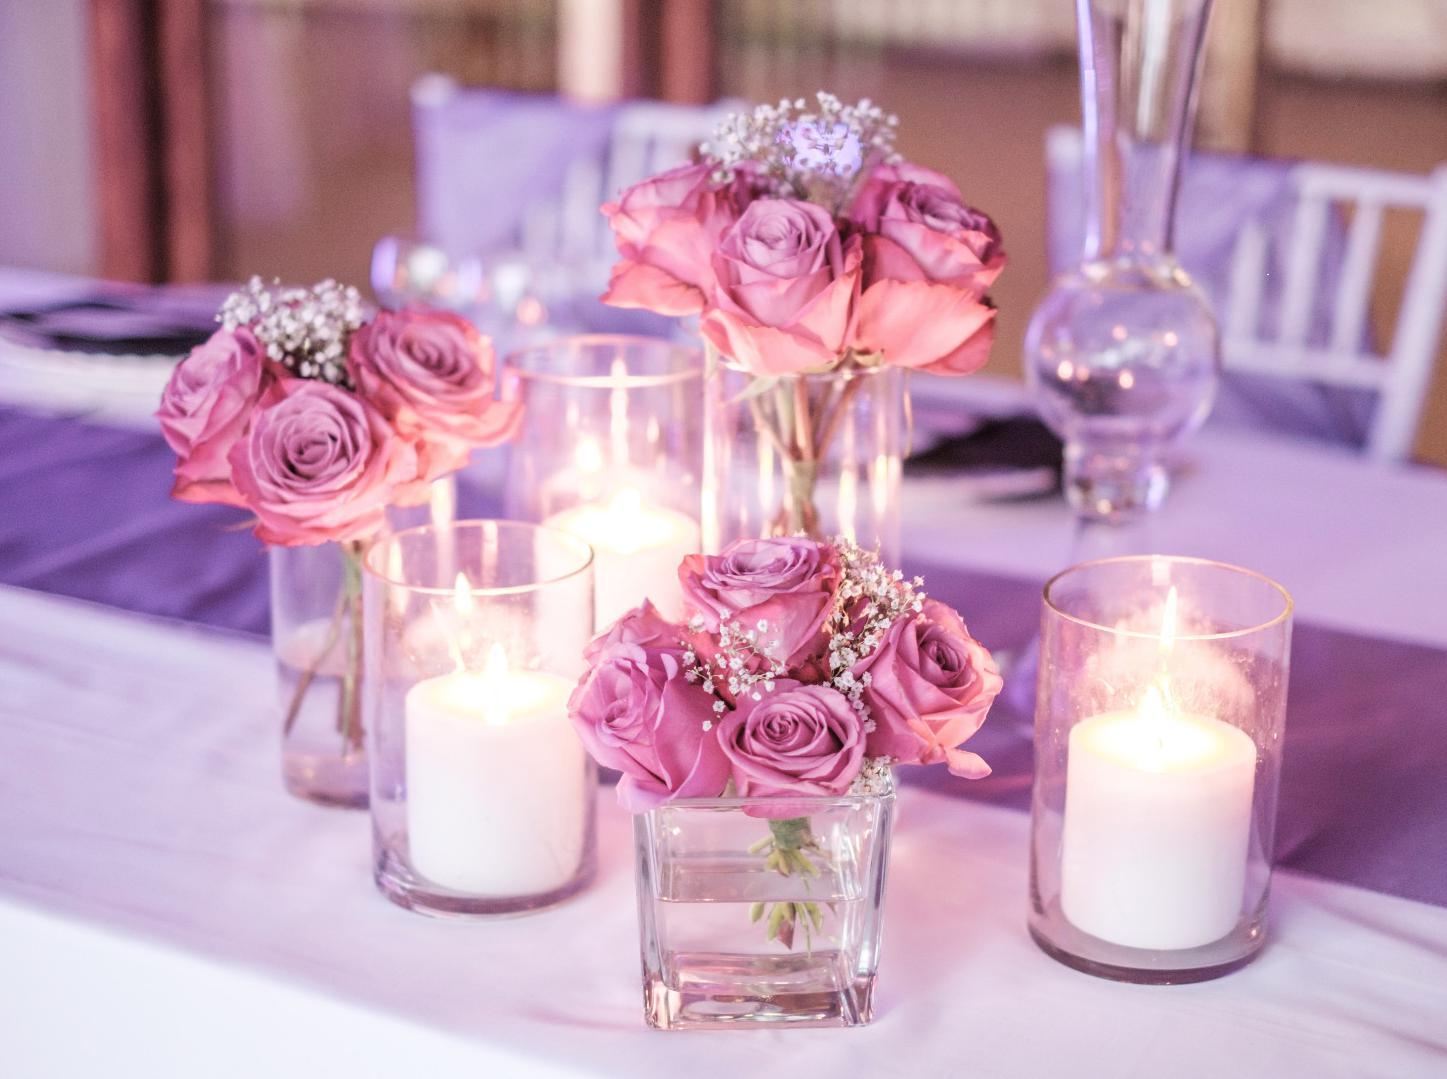 bodas-sin-clasificar-sin-tema-cuba-35671.jpg